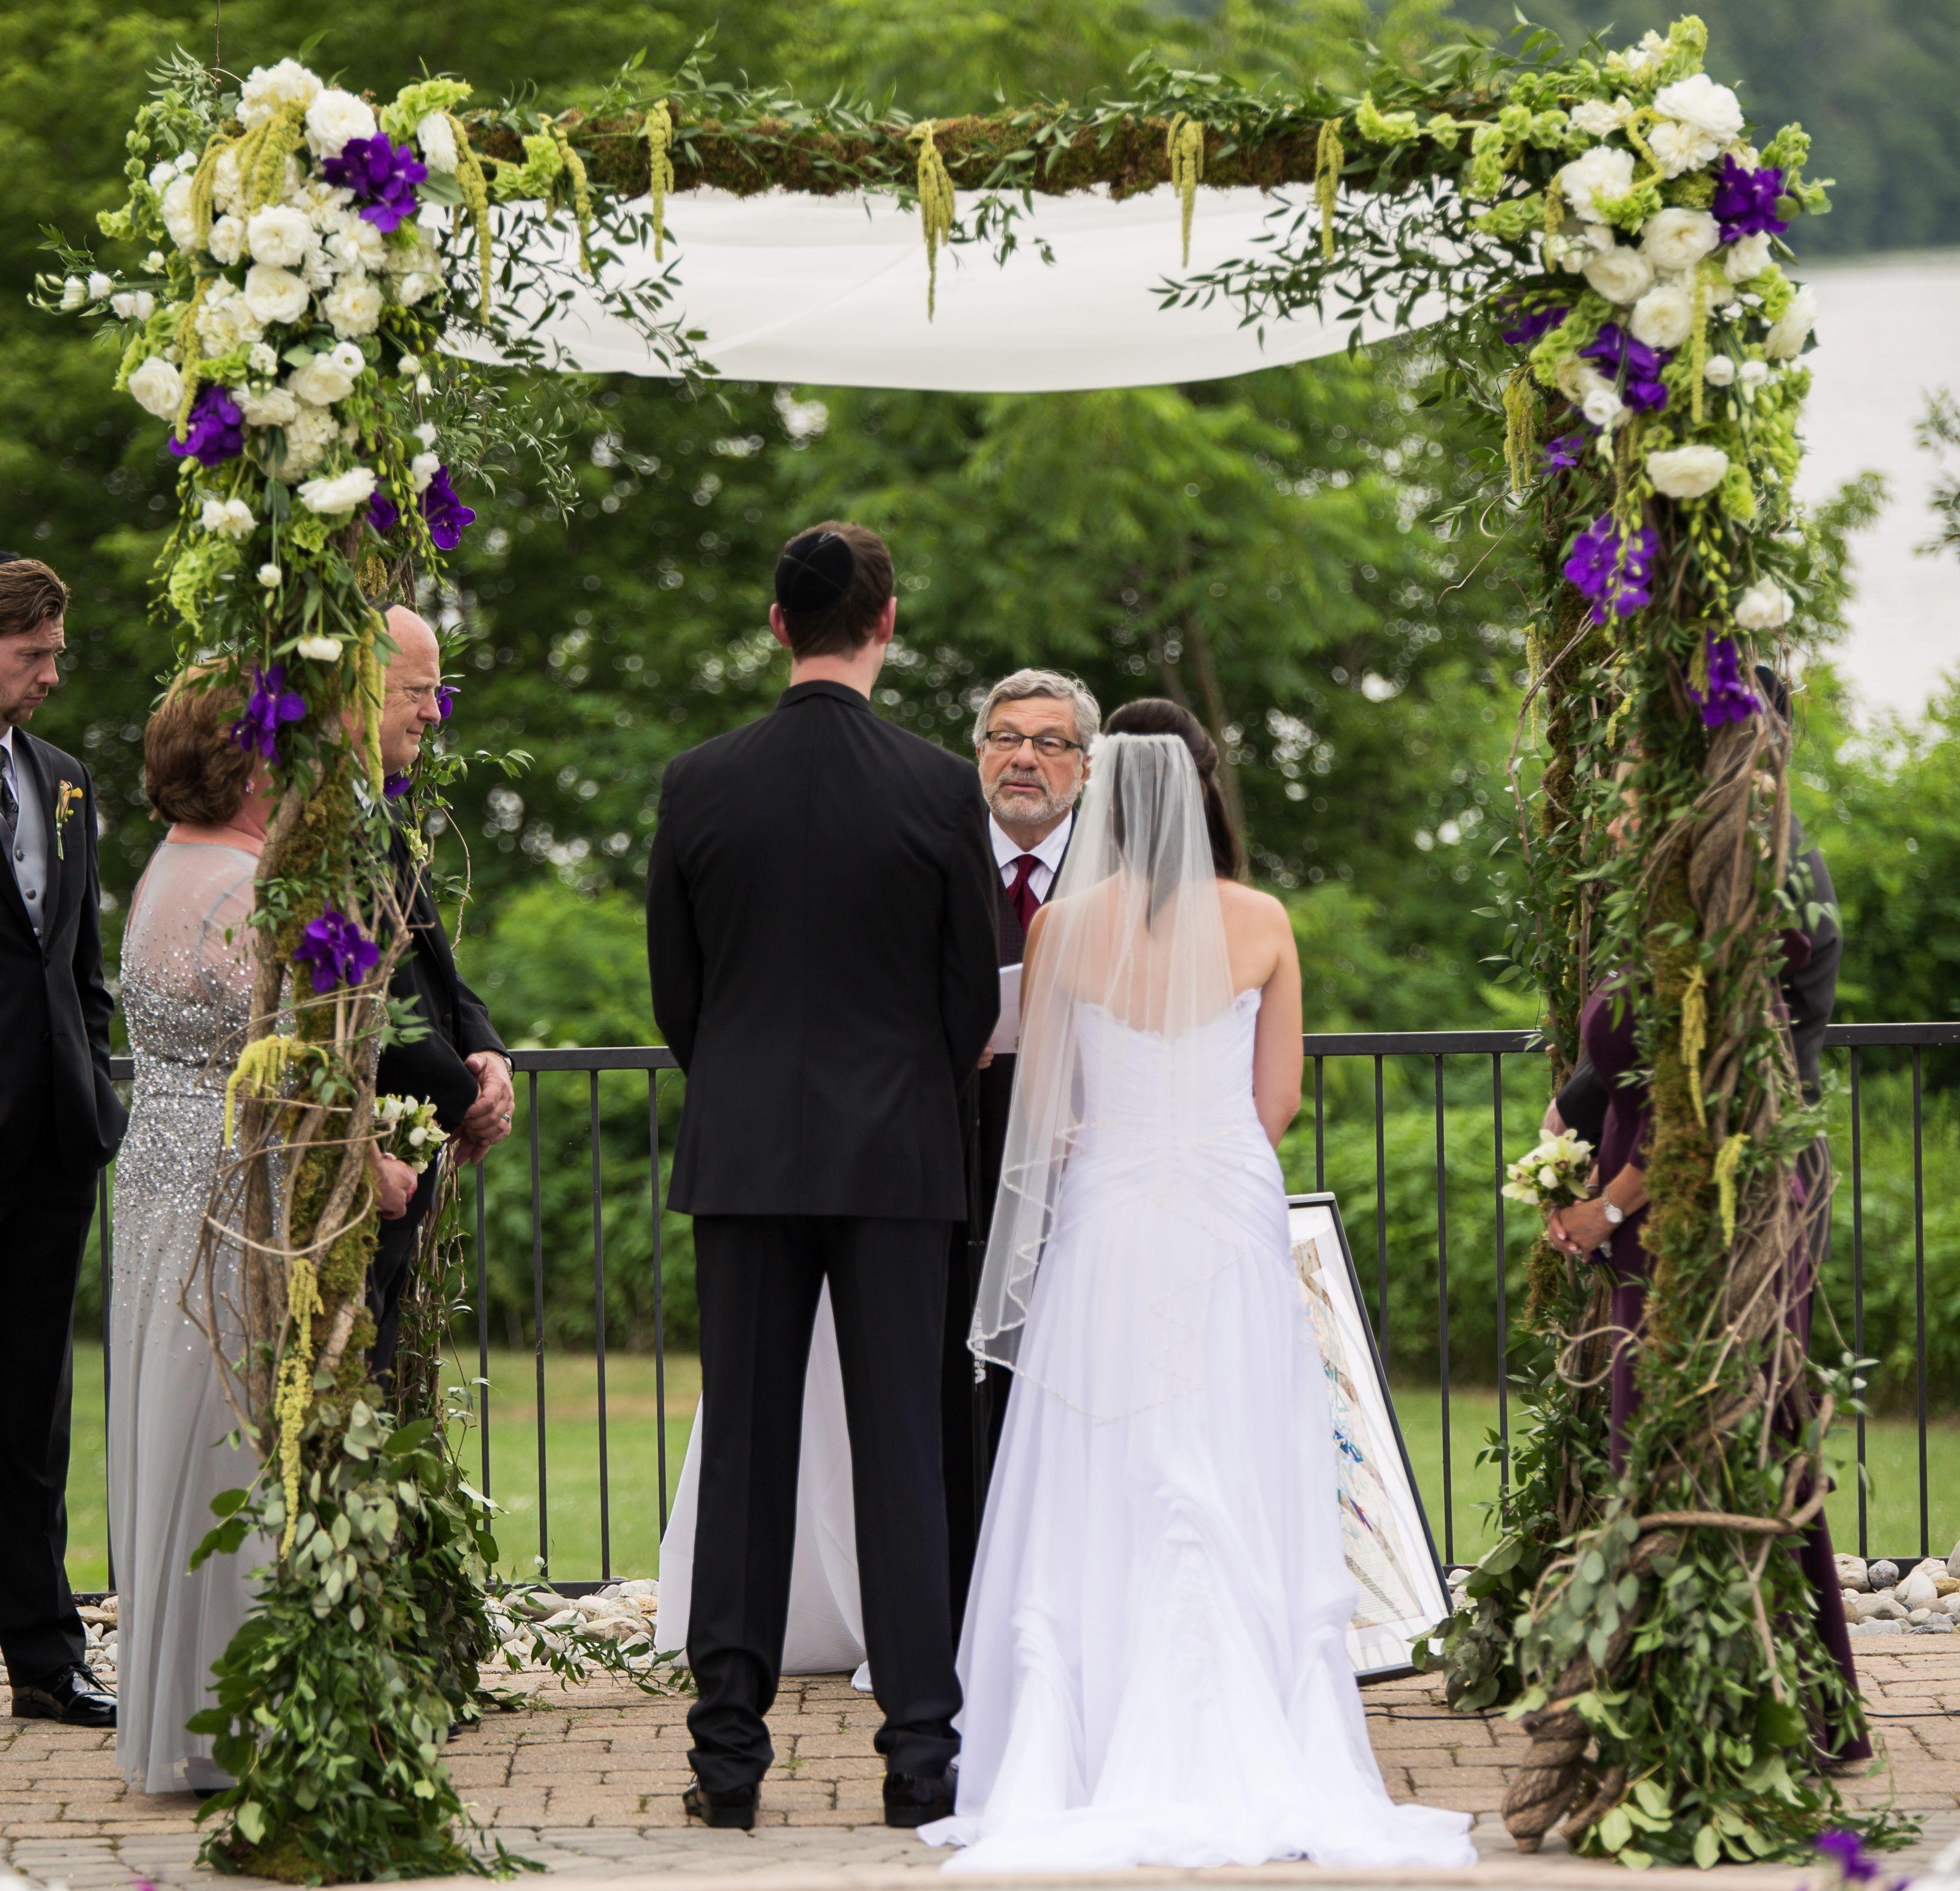 Rabbi Seymour Rosenbloom officiates an intermarriage.